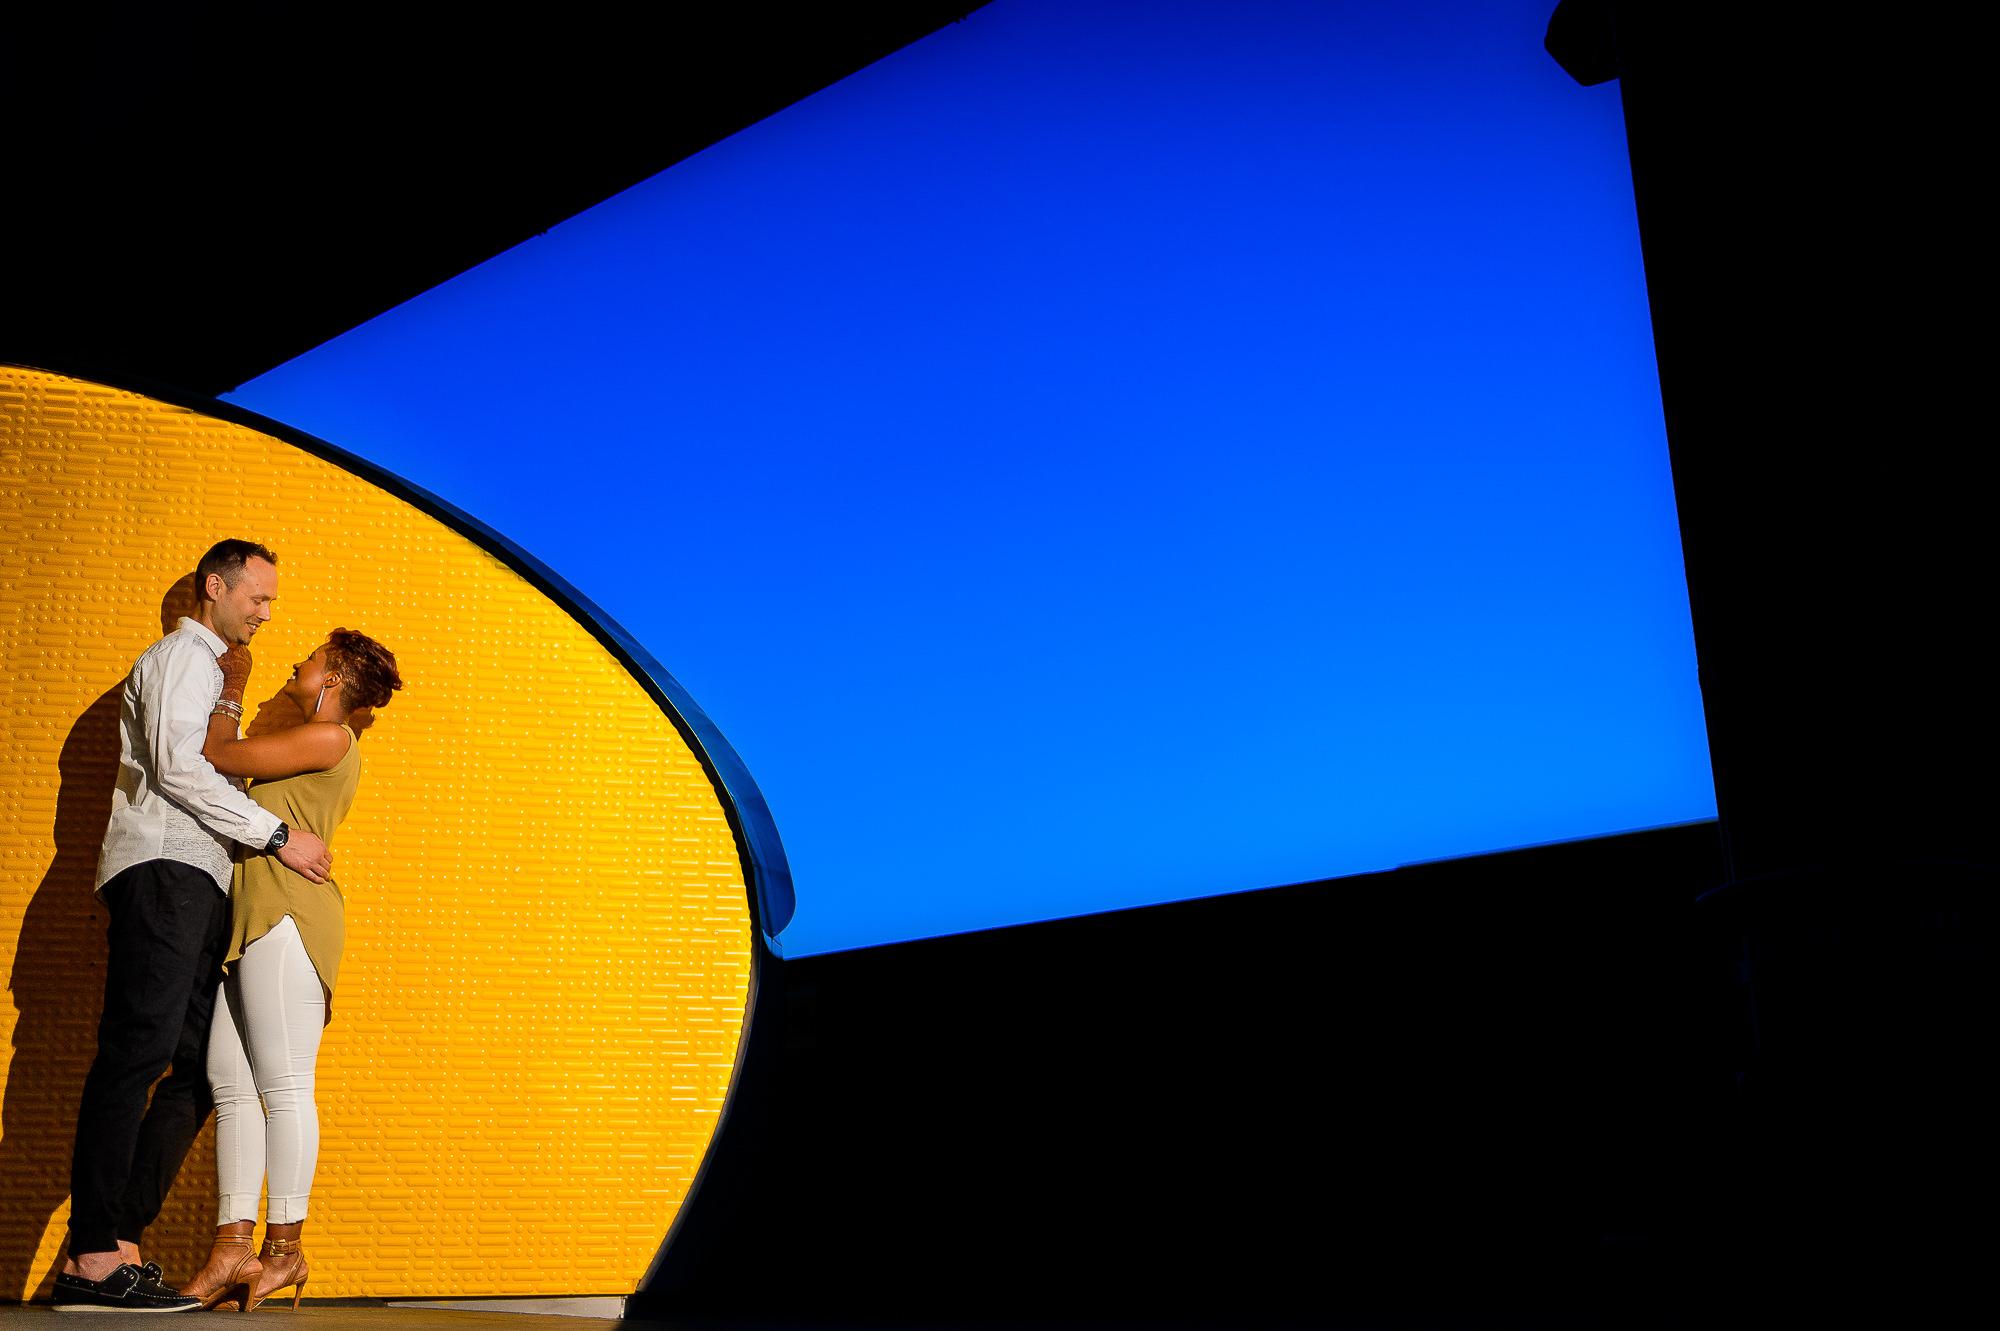 002-christopher-jason-studios-washington-dc-union-station-engagement-session-couple-embraces-under-blue-sky.jpg